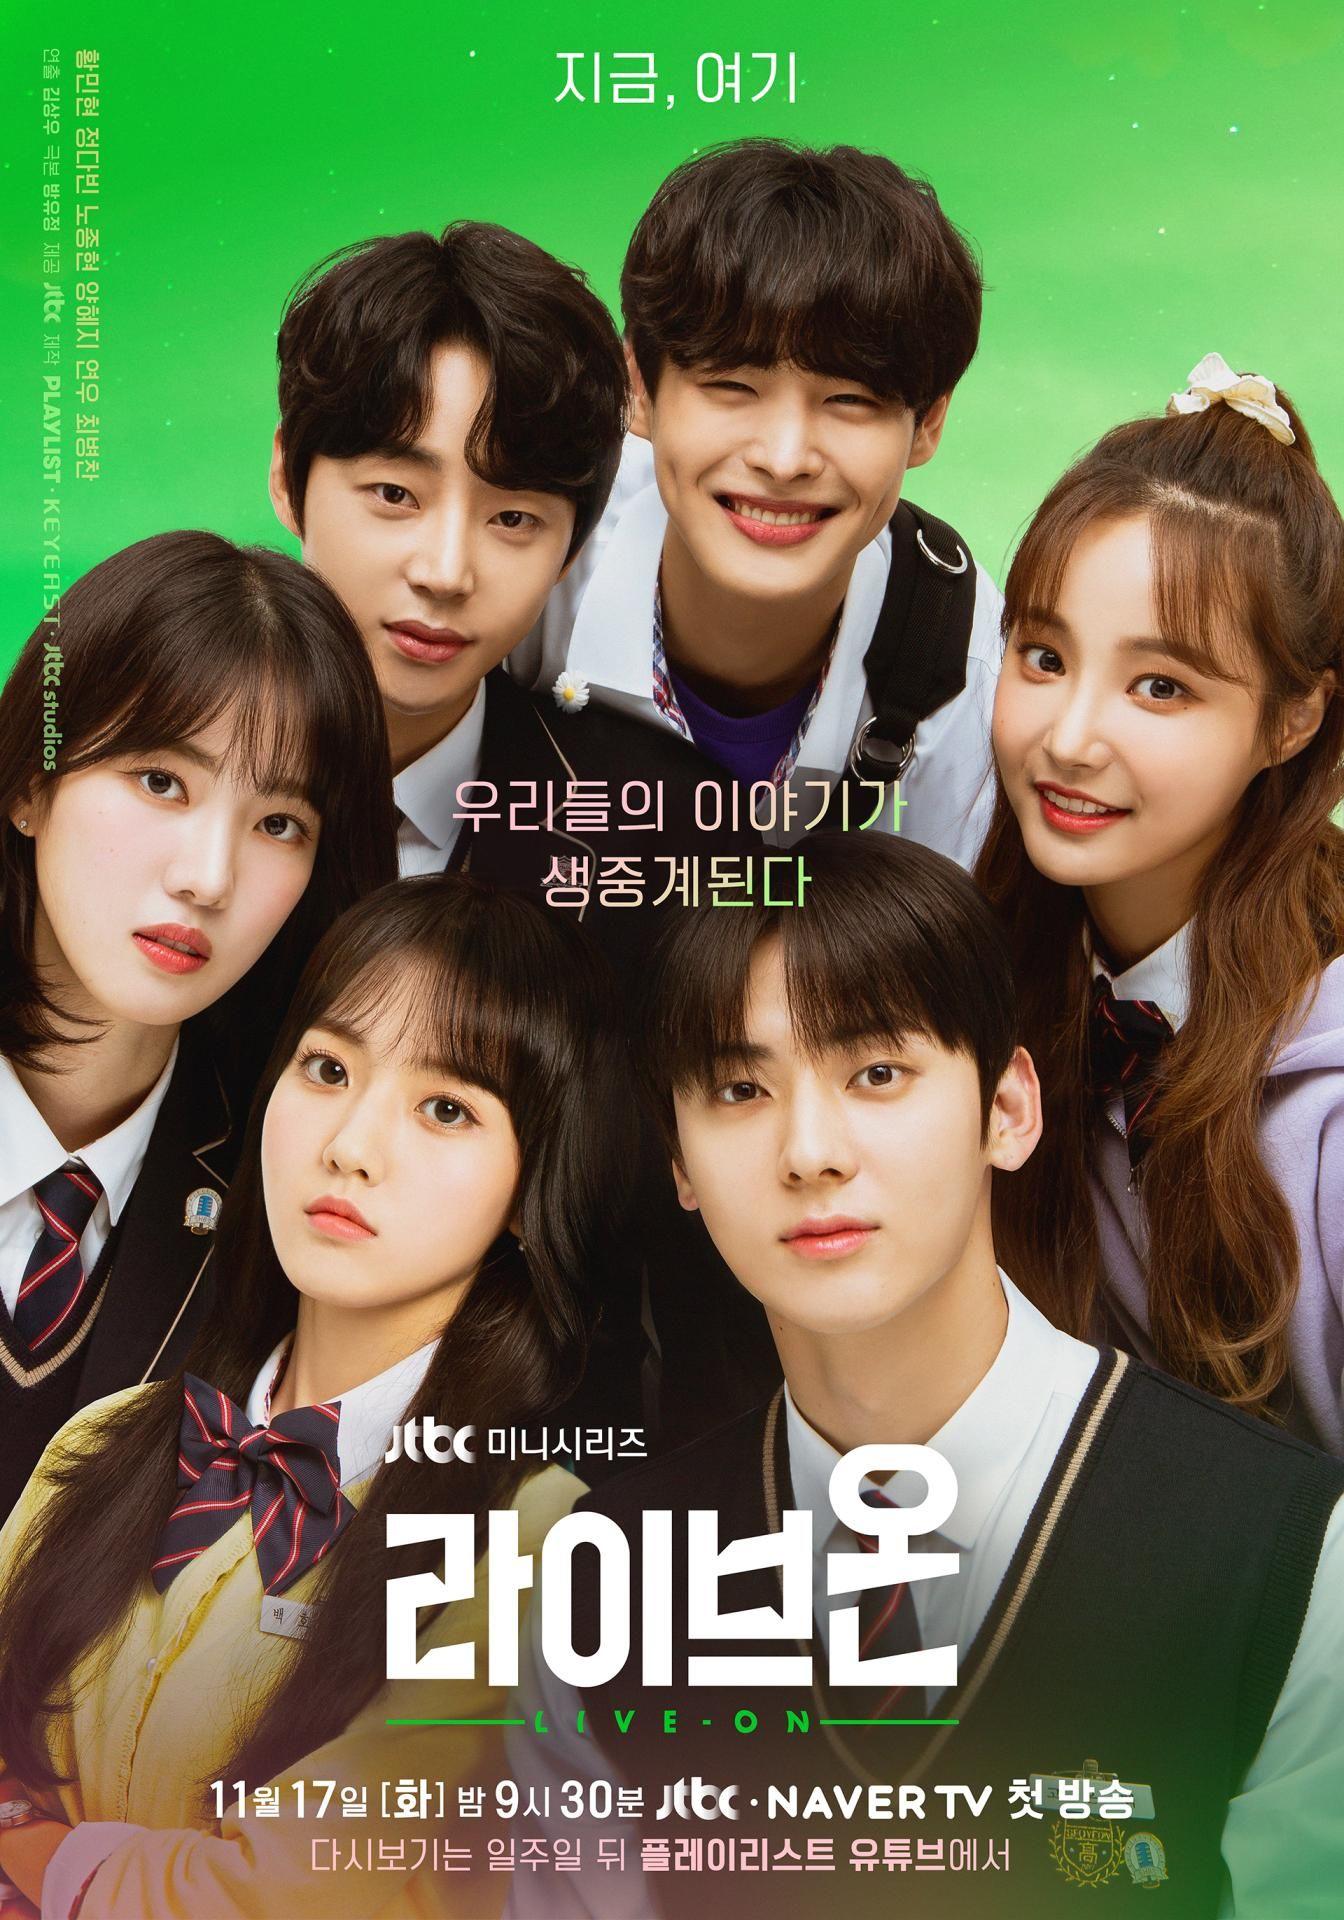 Dita On Twitter New Korean Drama Drama Korea Korean Drama Tv